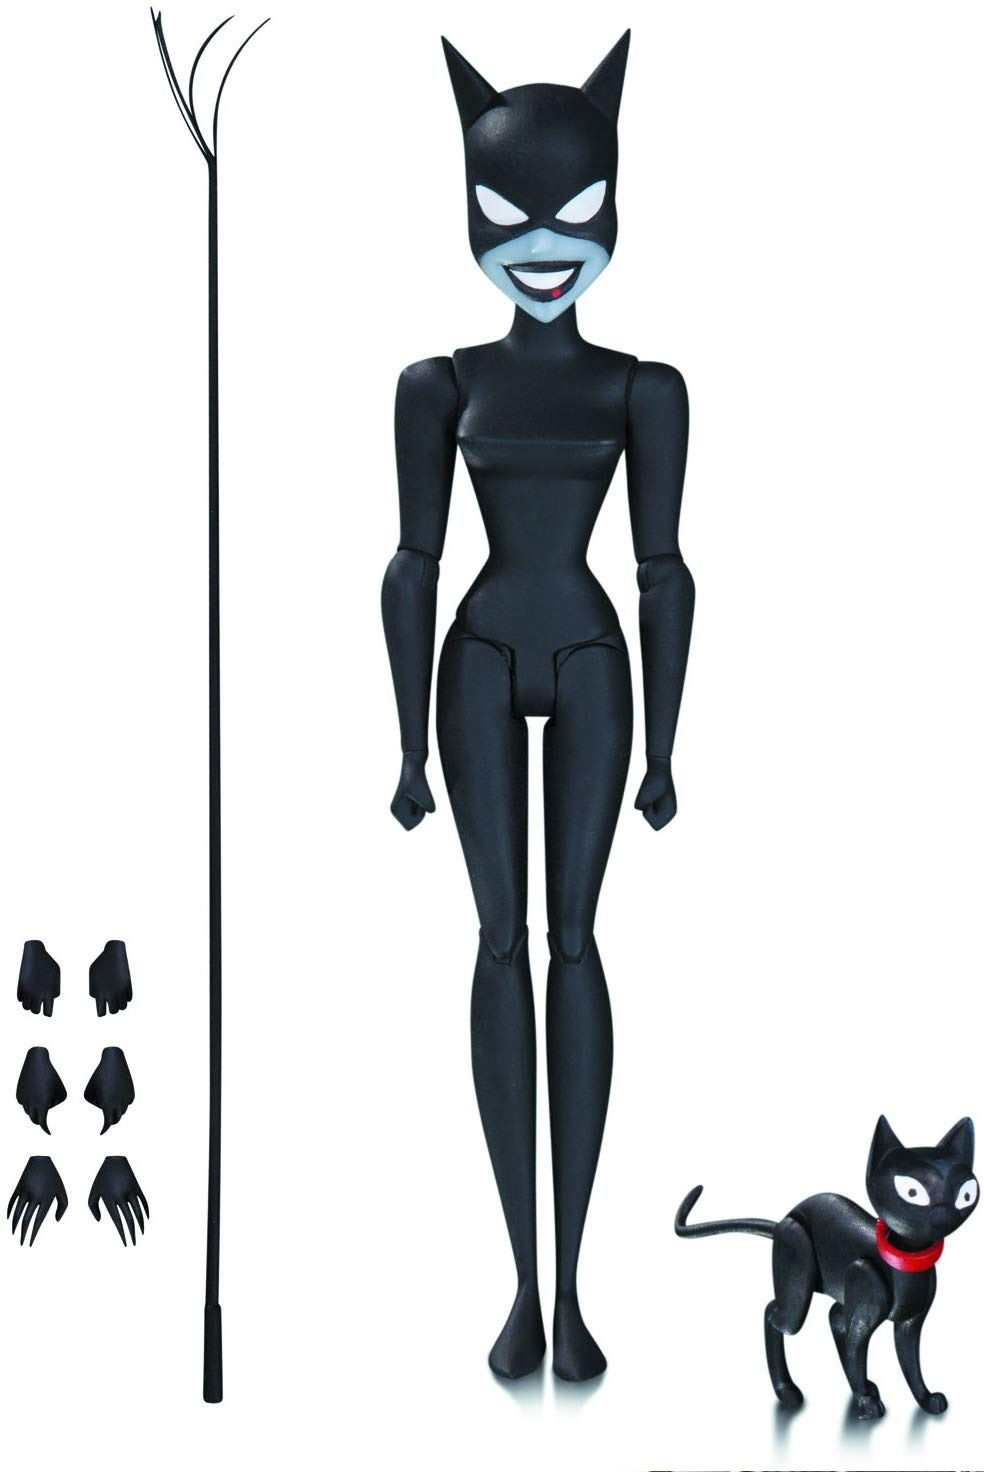 Boneco Catwoman: Batman New Adventures The Animated Series - DC Collectibles (Apenas Venda Online)